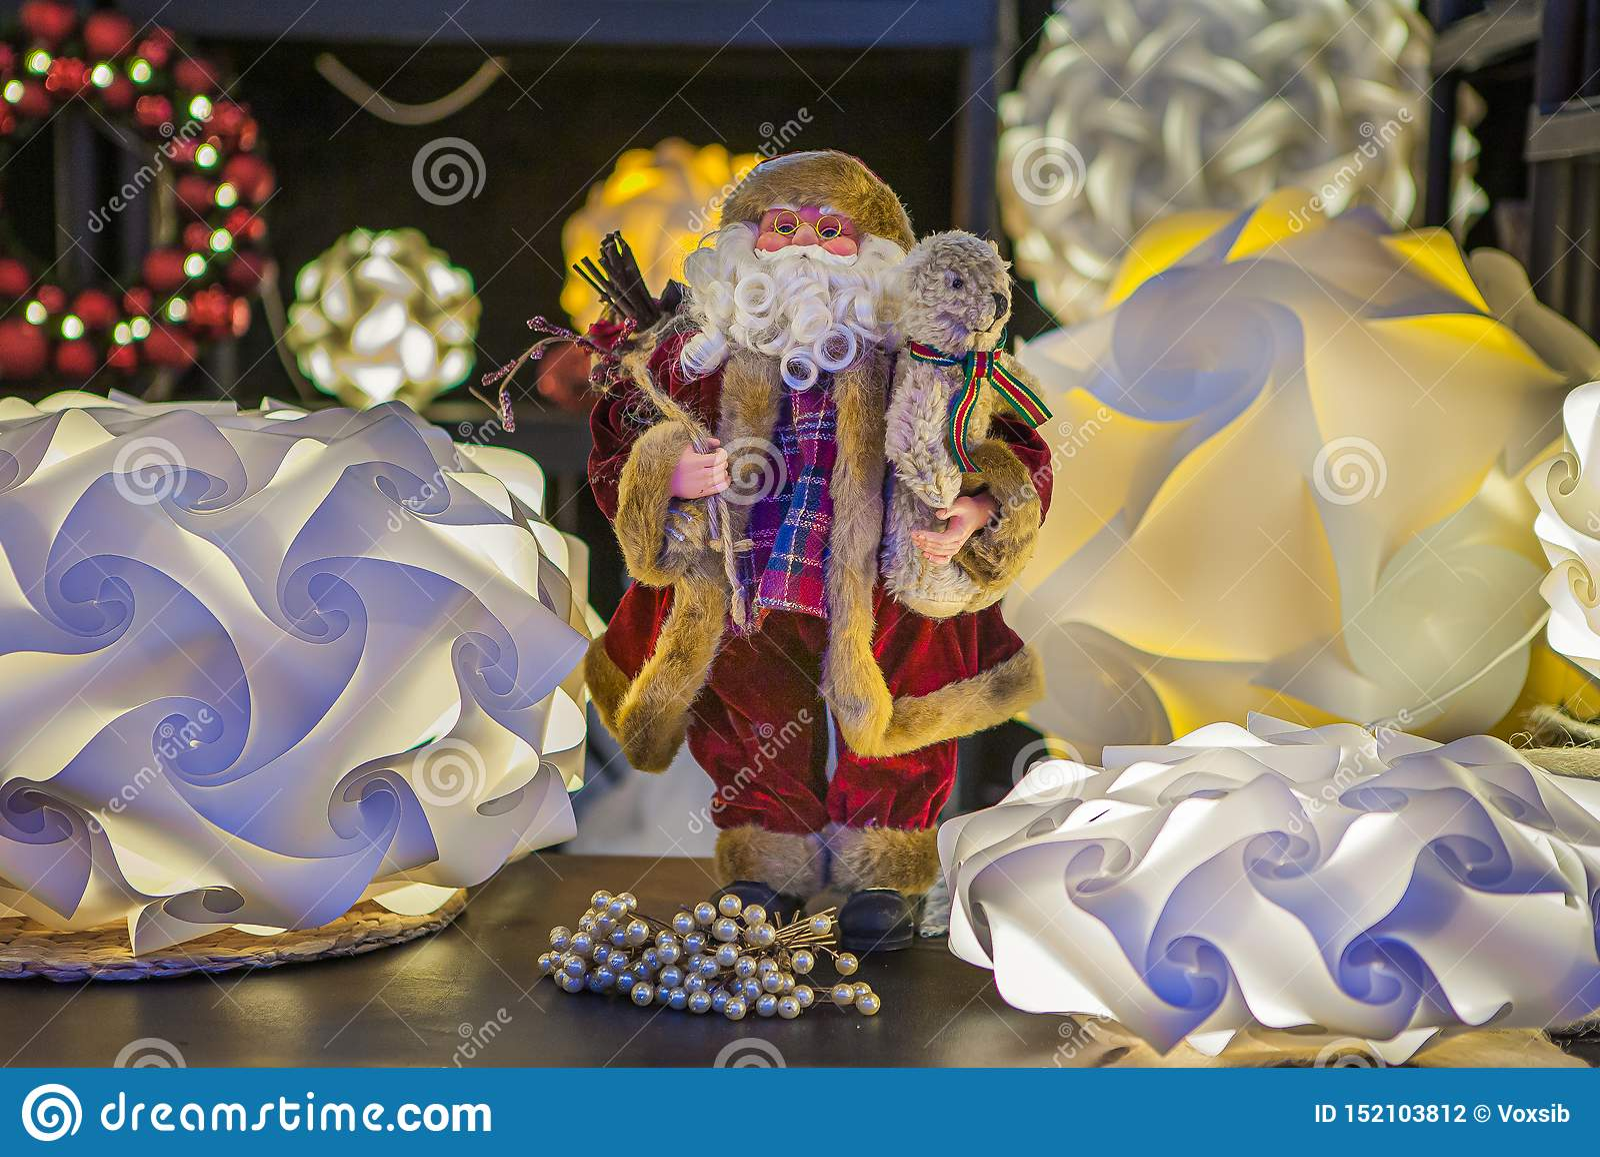 Festive Santa Claus, gives joy.